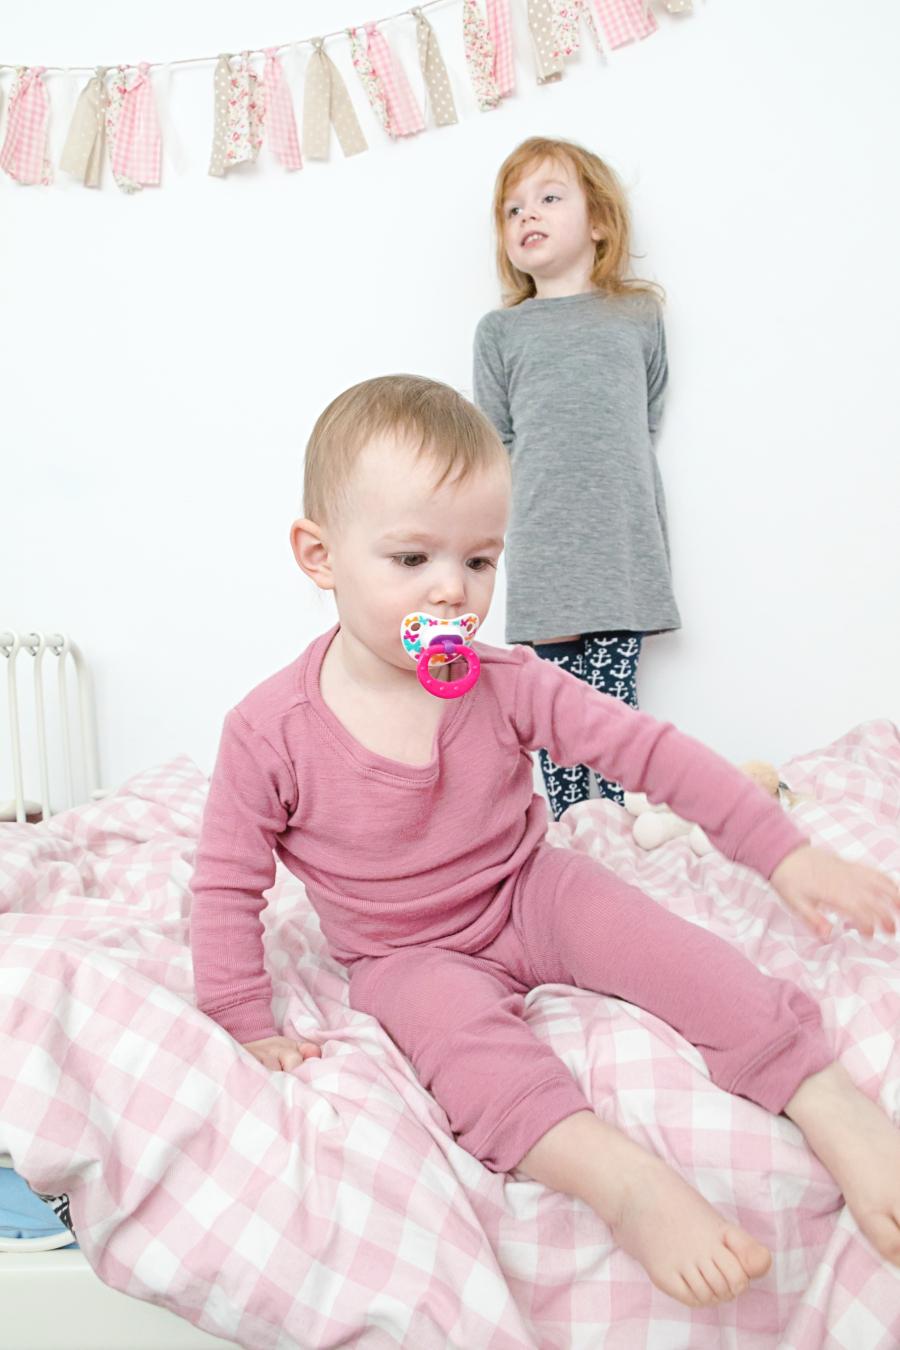 Simply Merino thermal merino wool pyjama set and dress in rose and heather grey